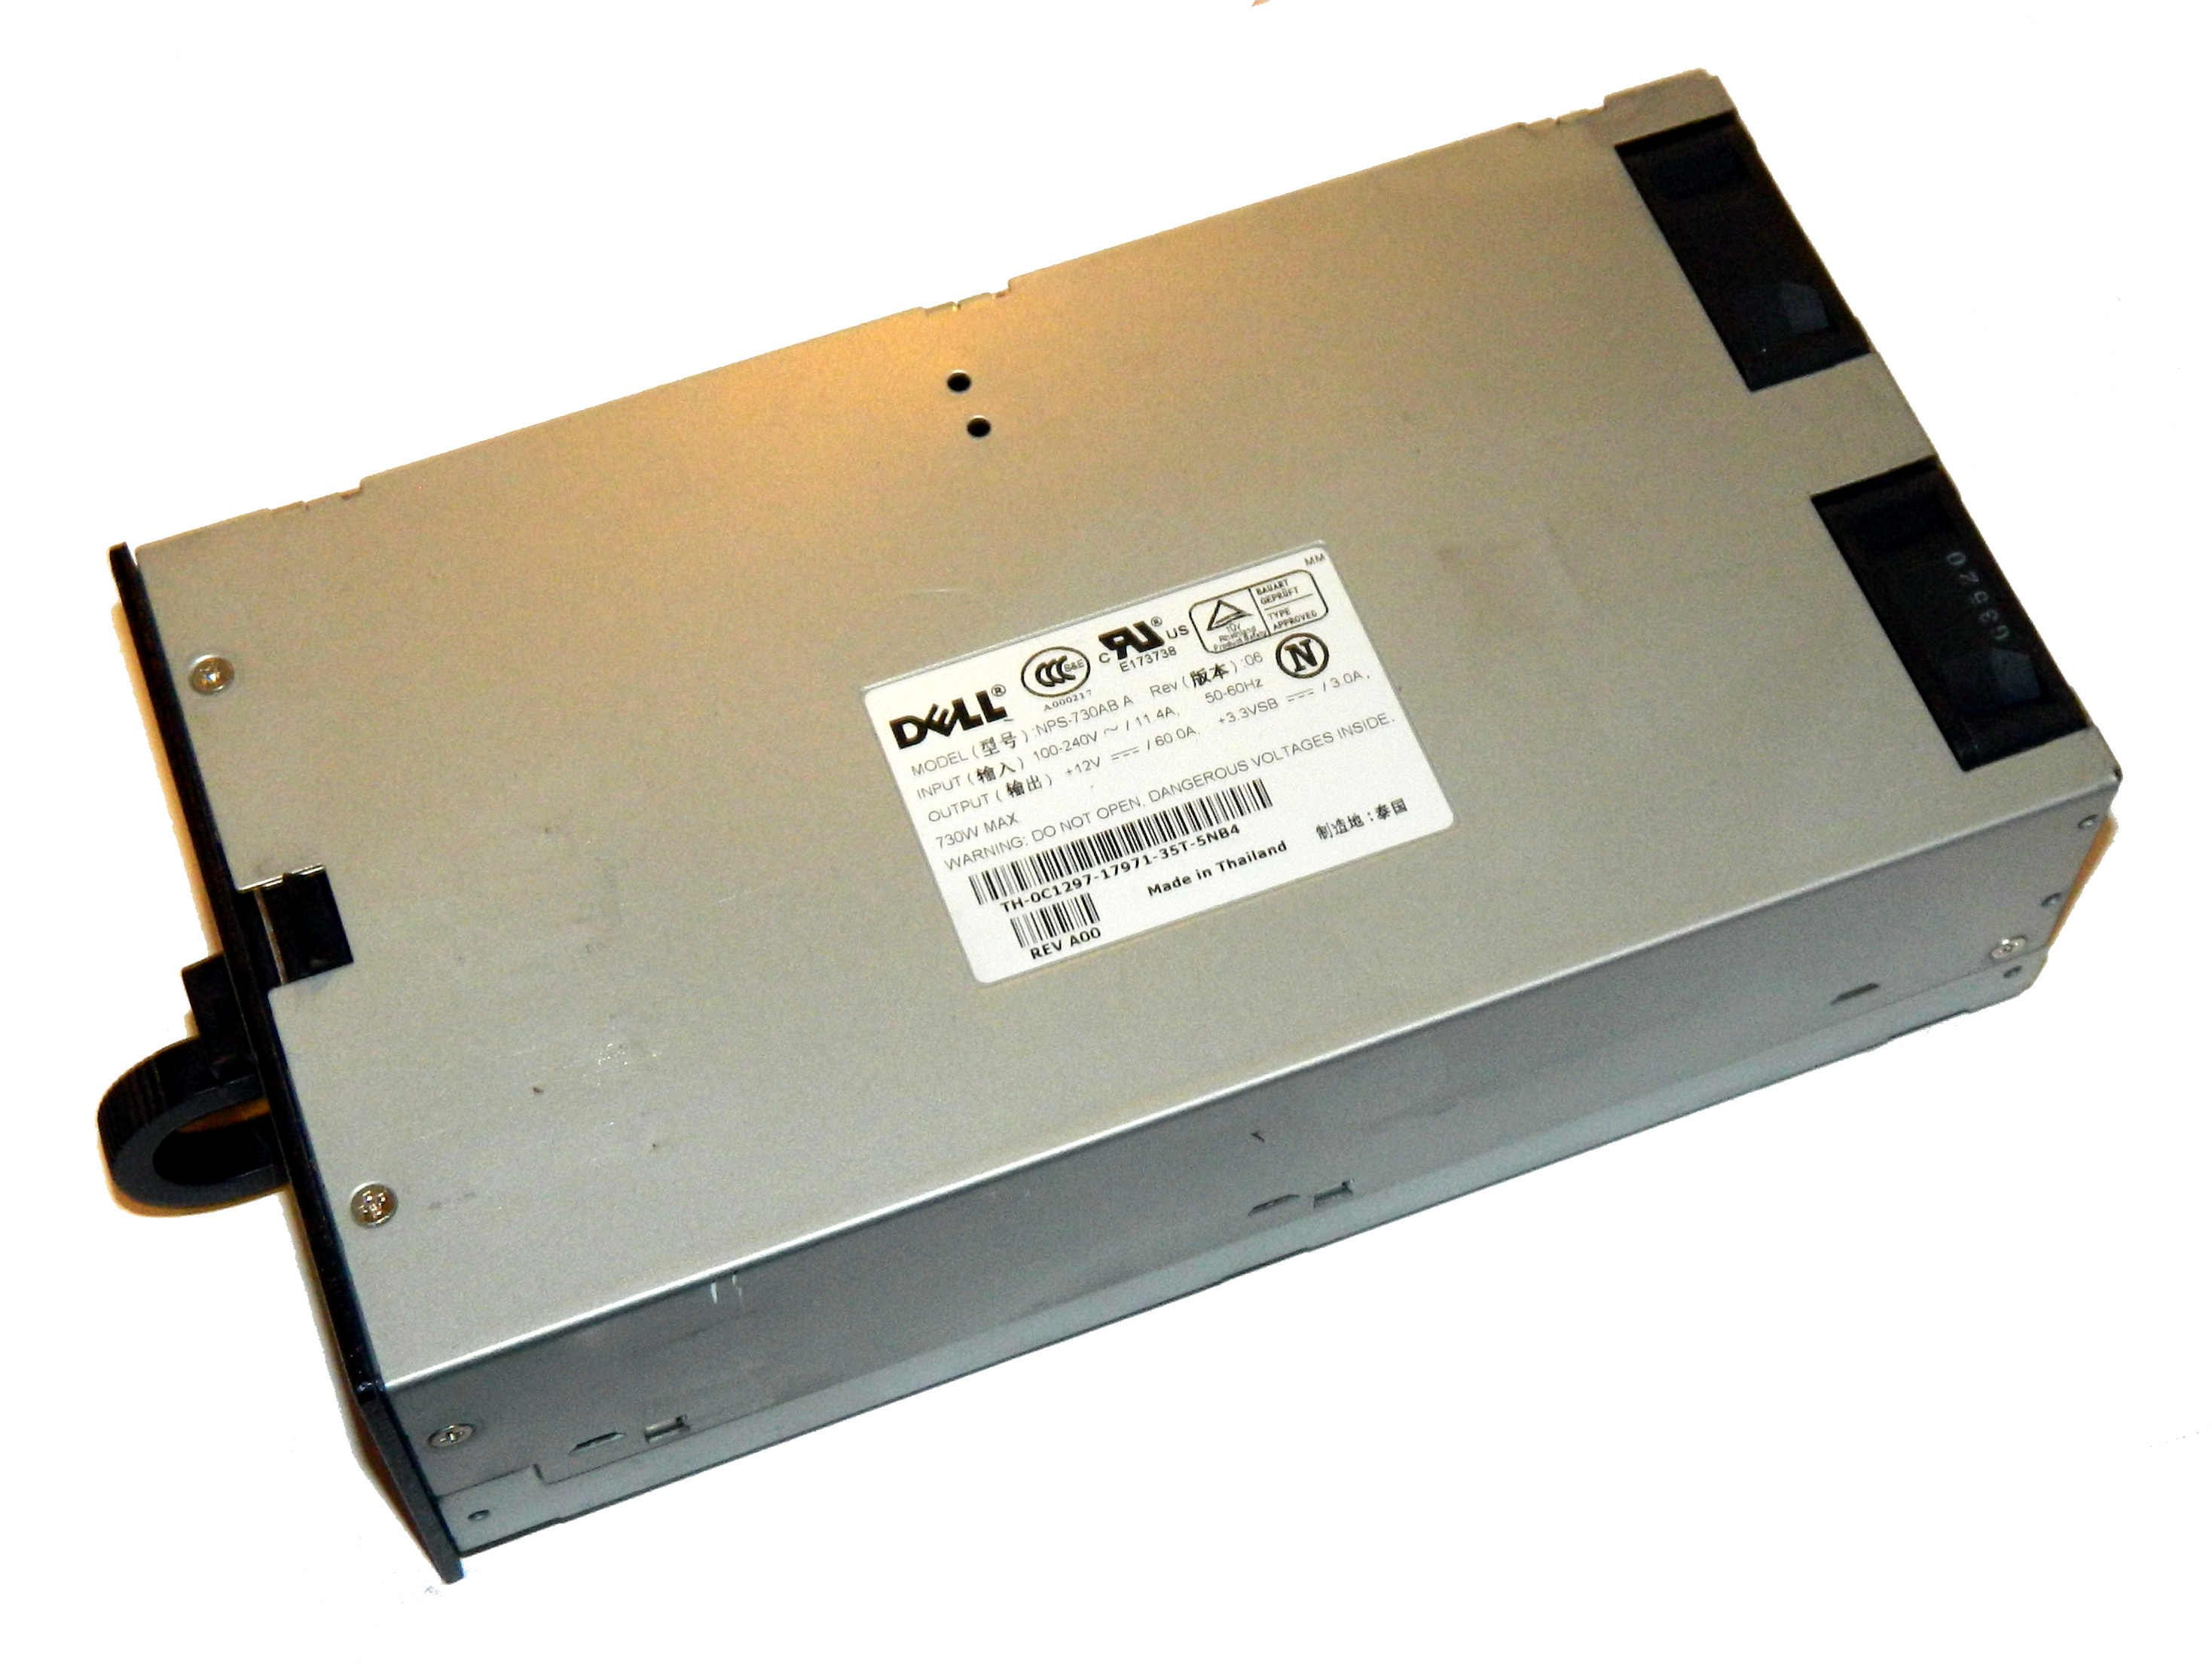 DELL PE2600 REDUNDANT 730W POWER SUPPLY